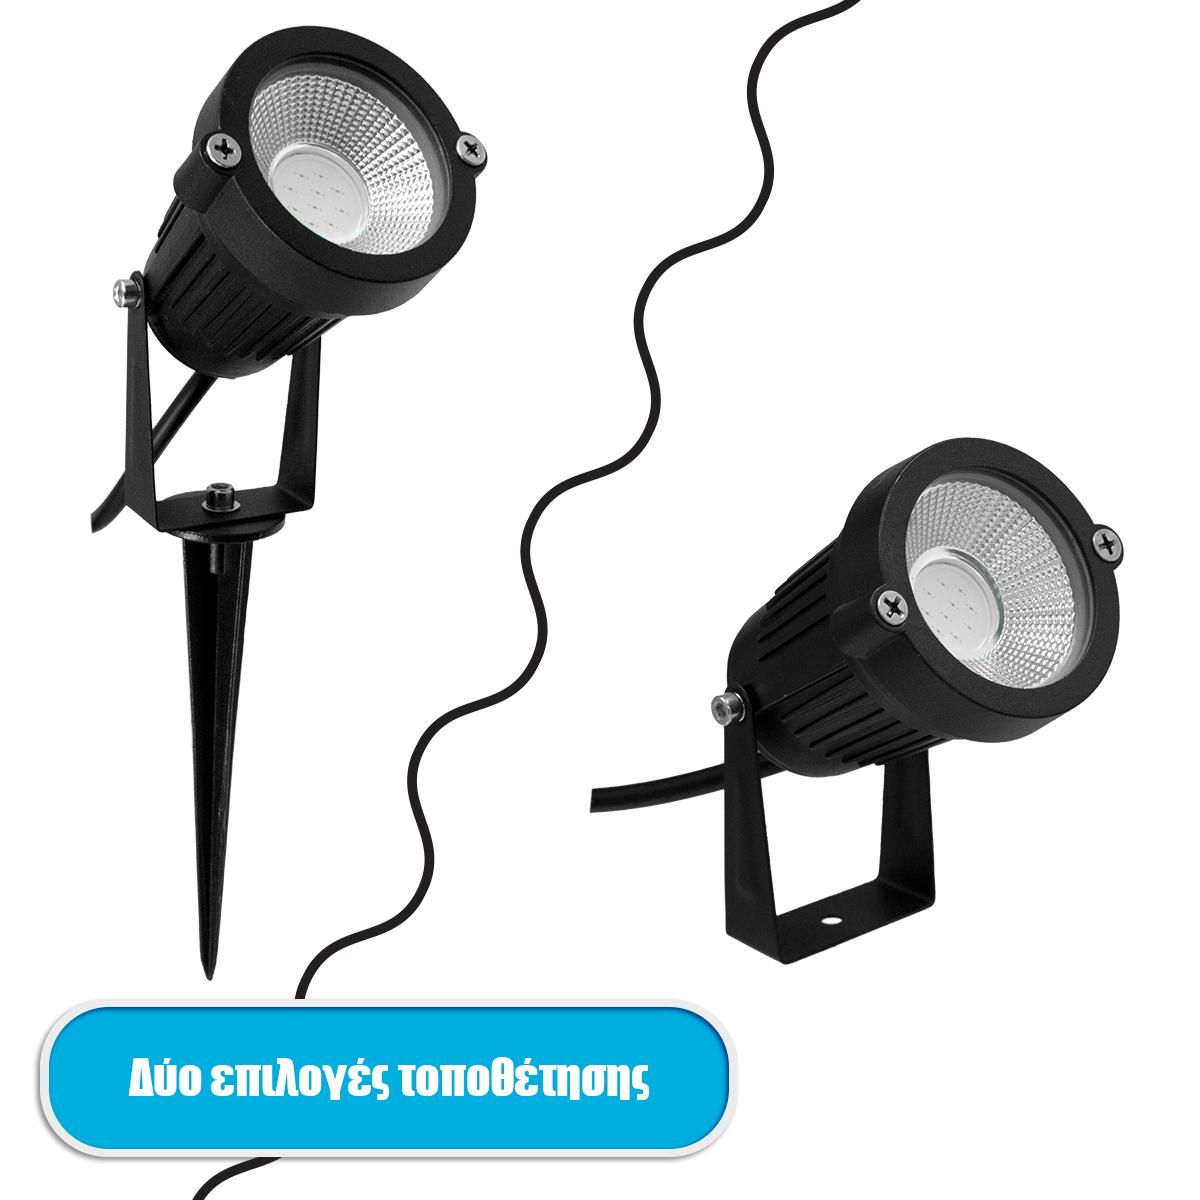 globostar-75587-provolaki-kipou-karfoto-dapedou-bridgelux-cob-led-10w-1000lm-35-dc-12-24v-adiavroho-ip67-ultra-ble-dimmable